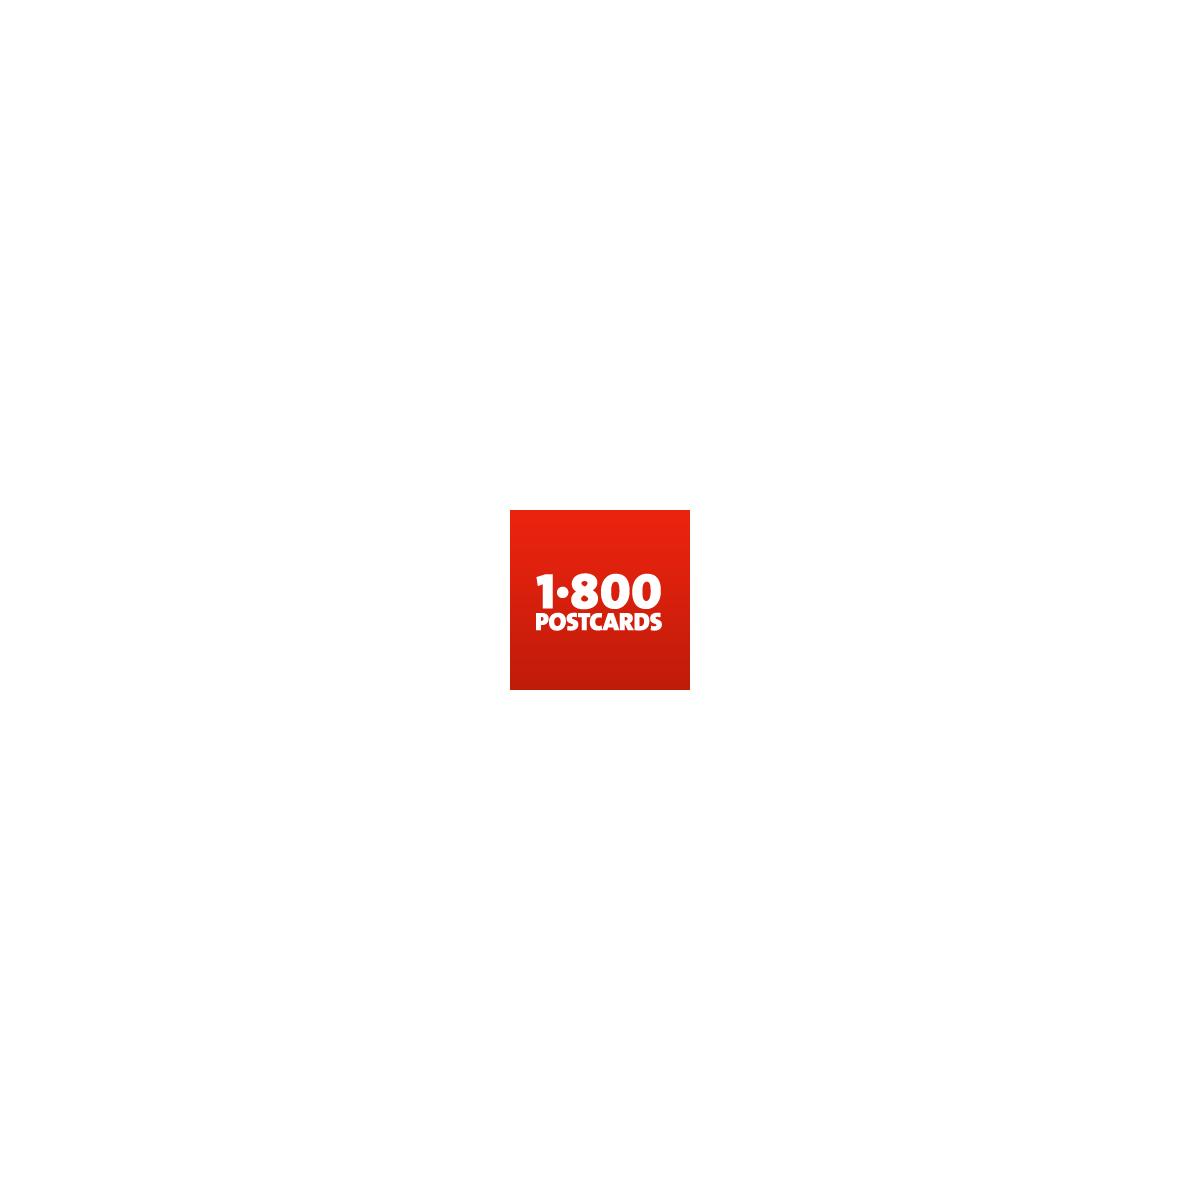 1 800 Postcards